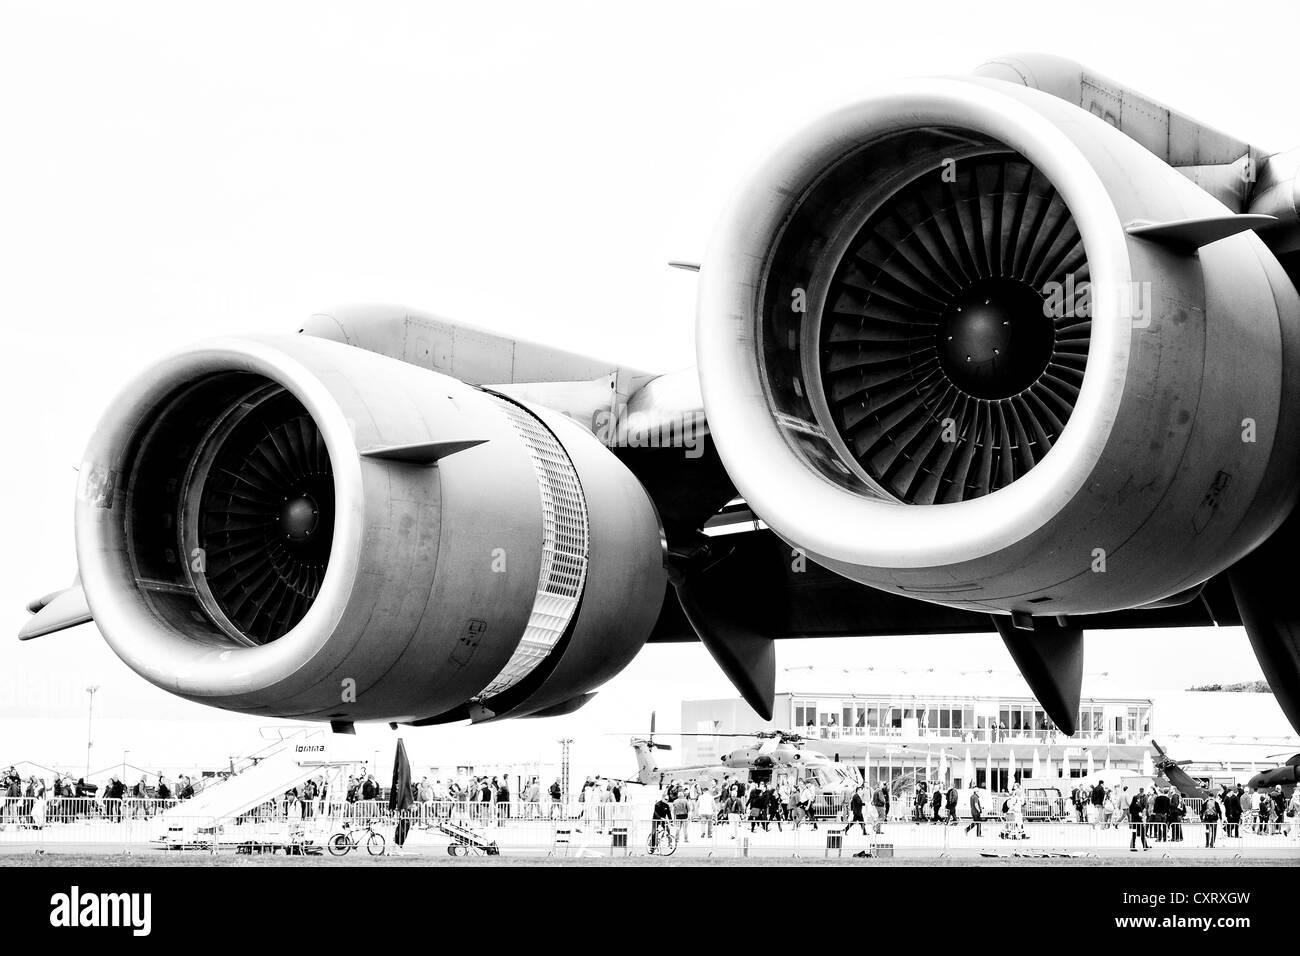 Motores Boeing C-17 Globemaster (blanco y negro) Imagen De Stock